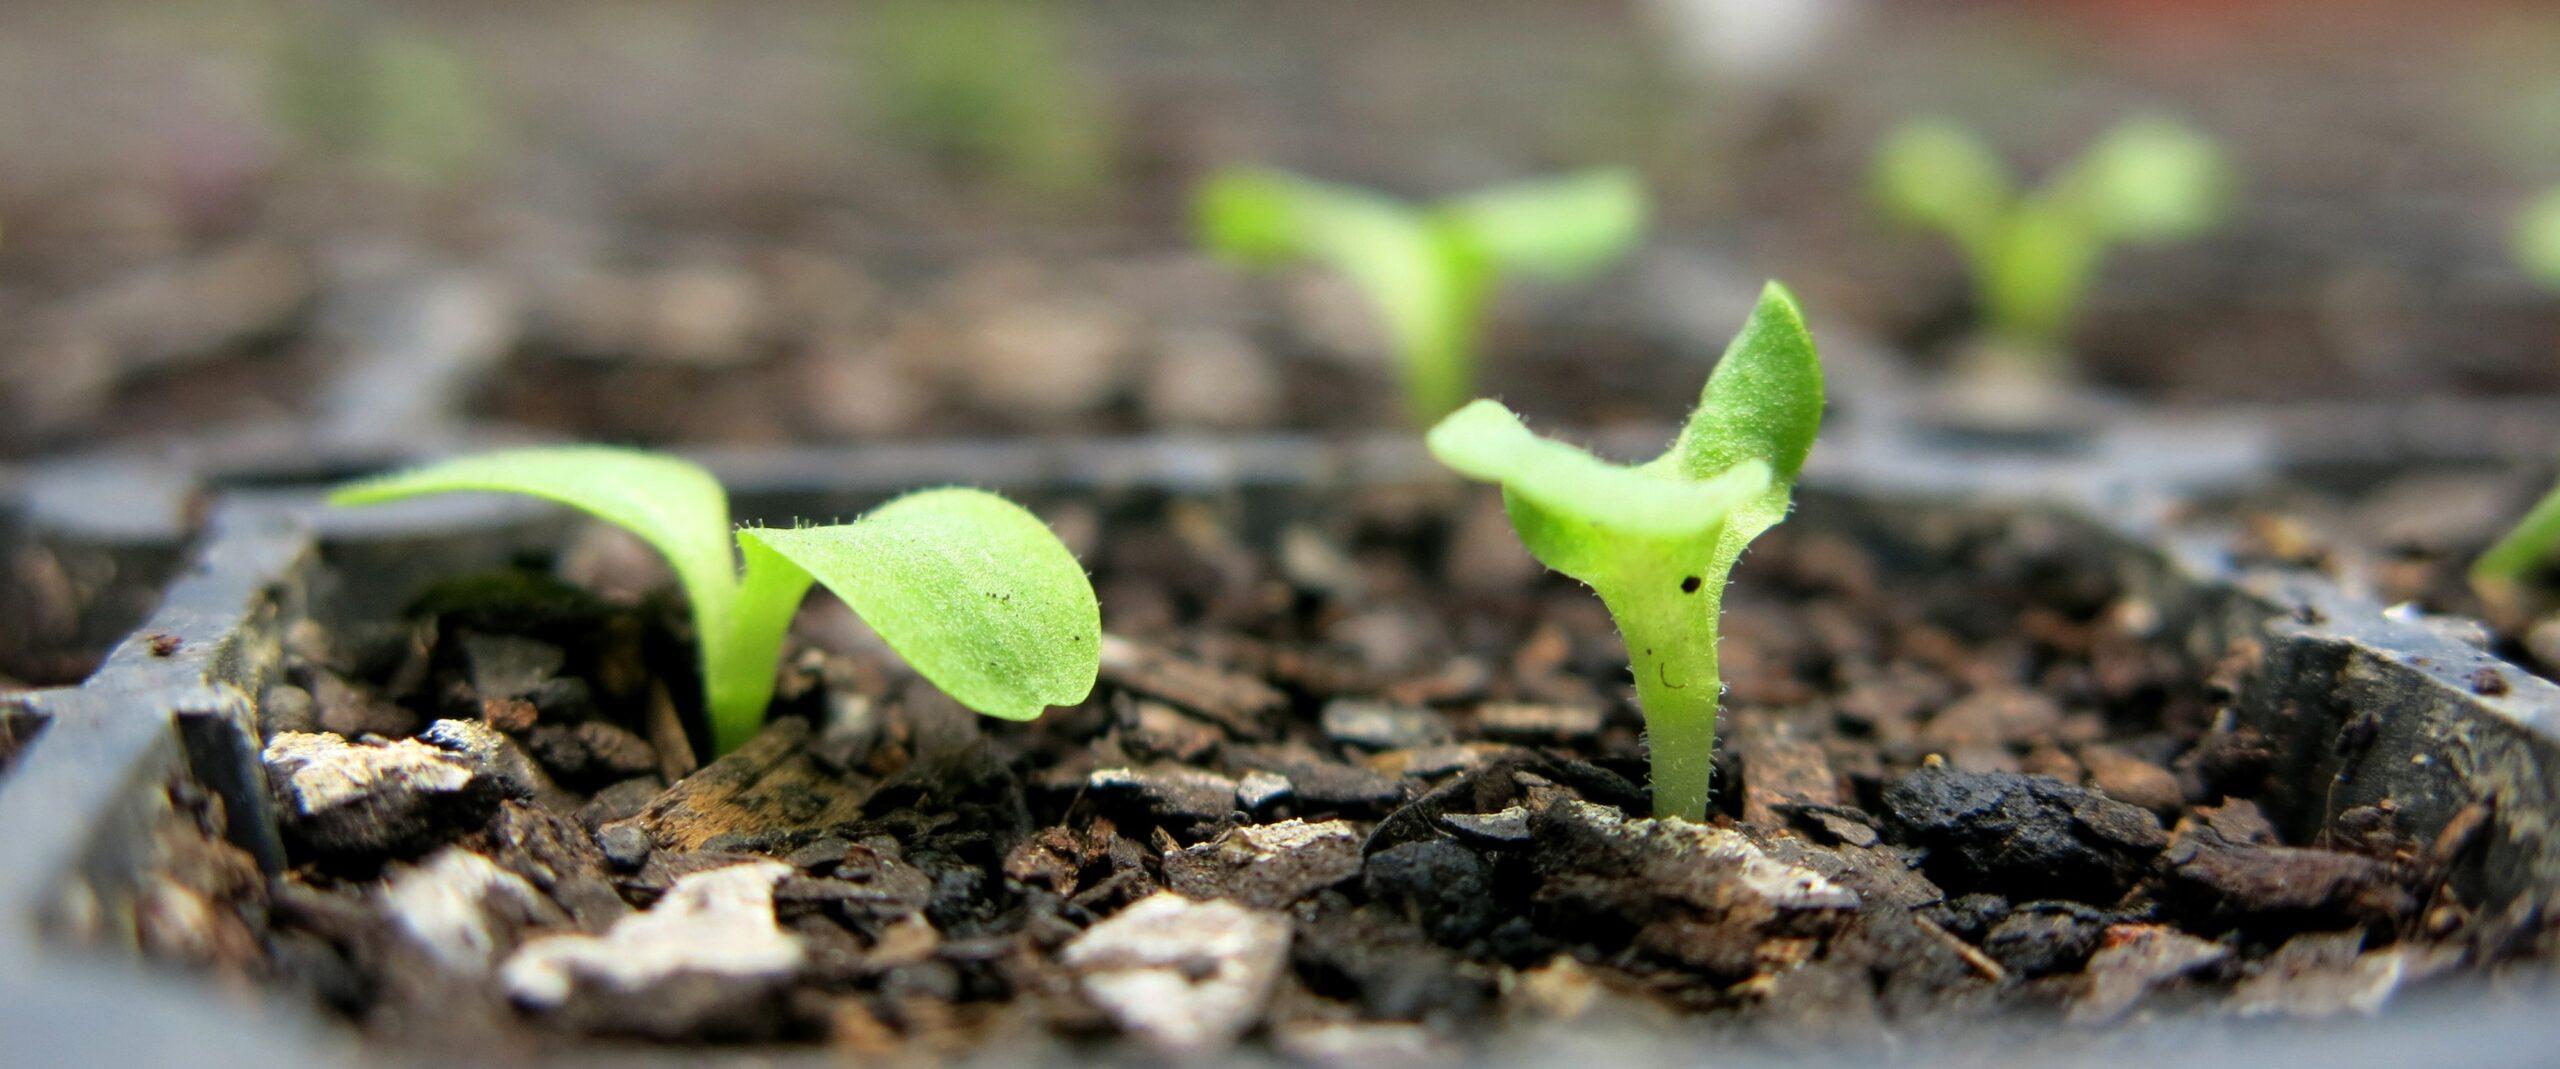 Semear, coletar, guardar e compartilhar sementes